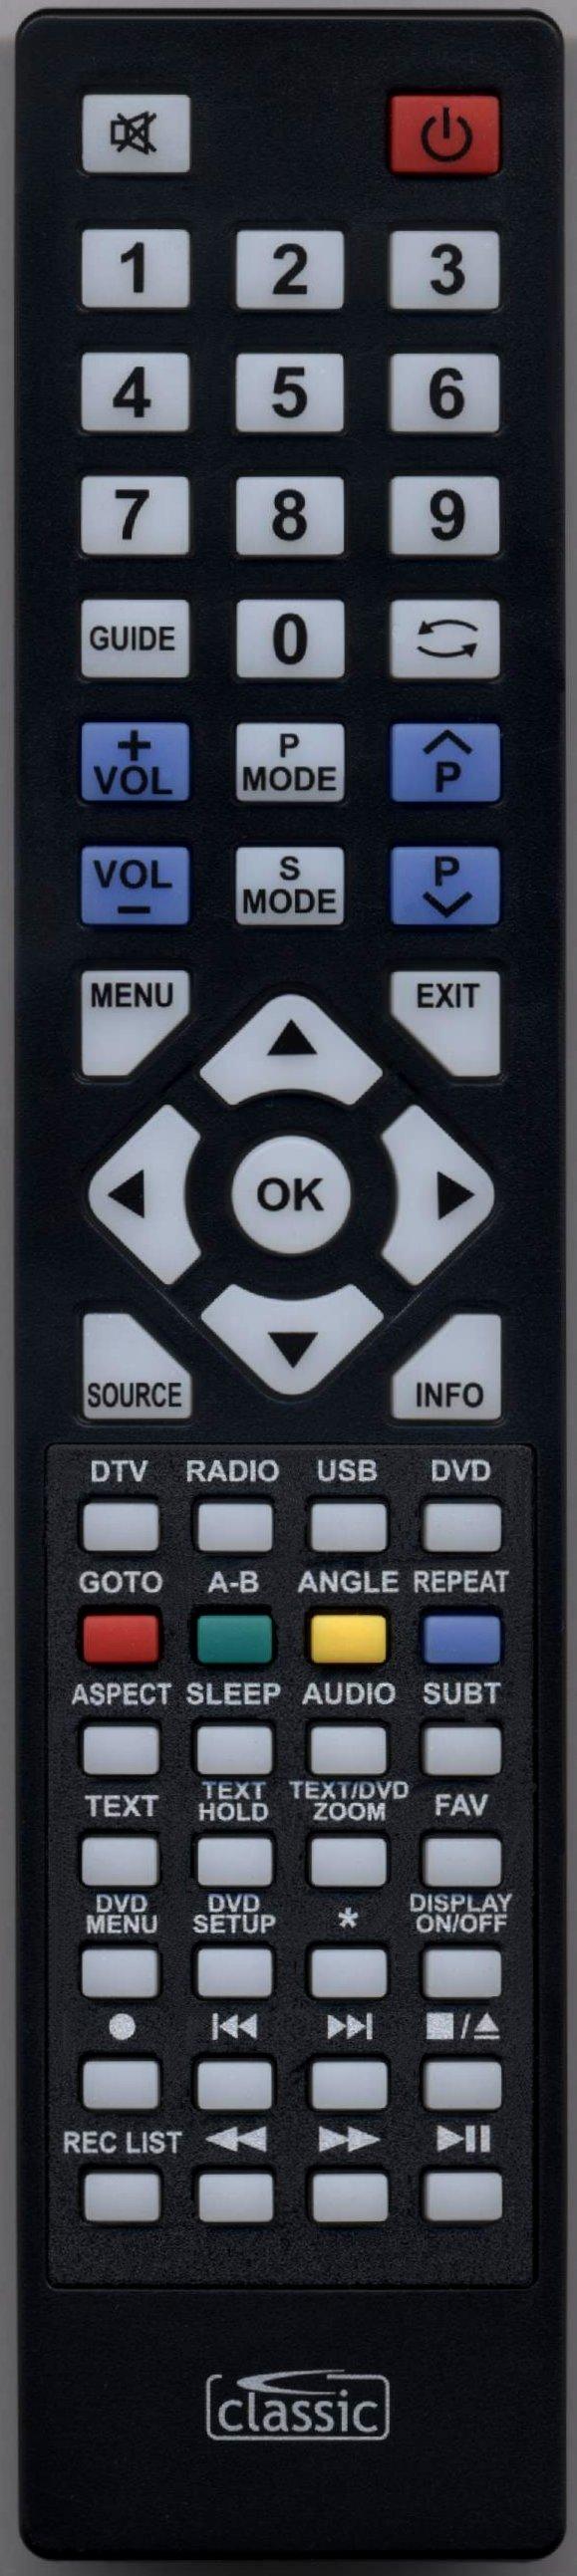 BLAUPUNKT 40/148Z-GB-5B2-FGKU-UK Remote Control Alternative